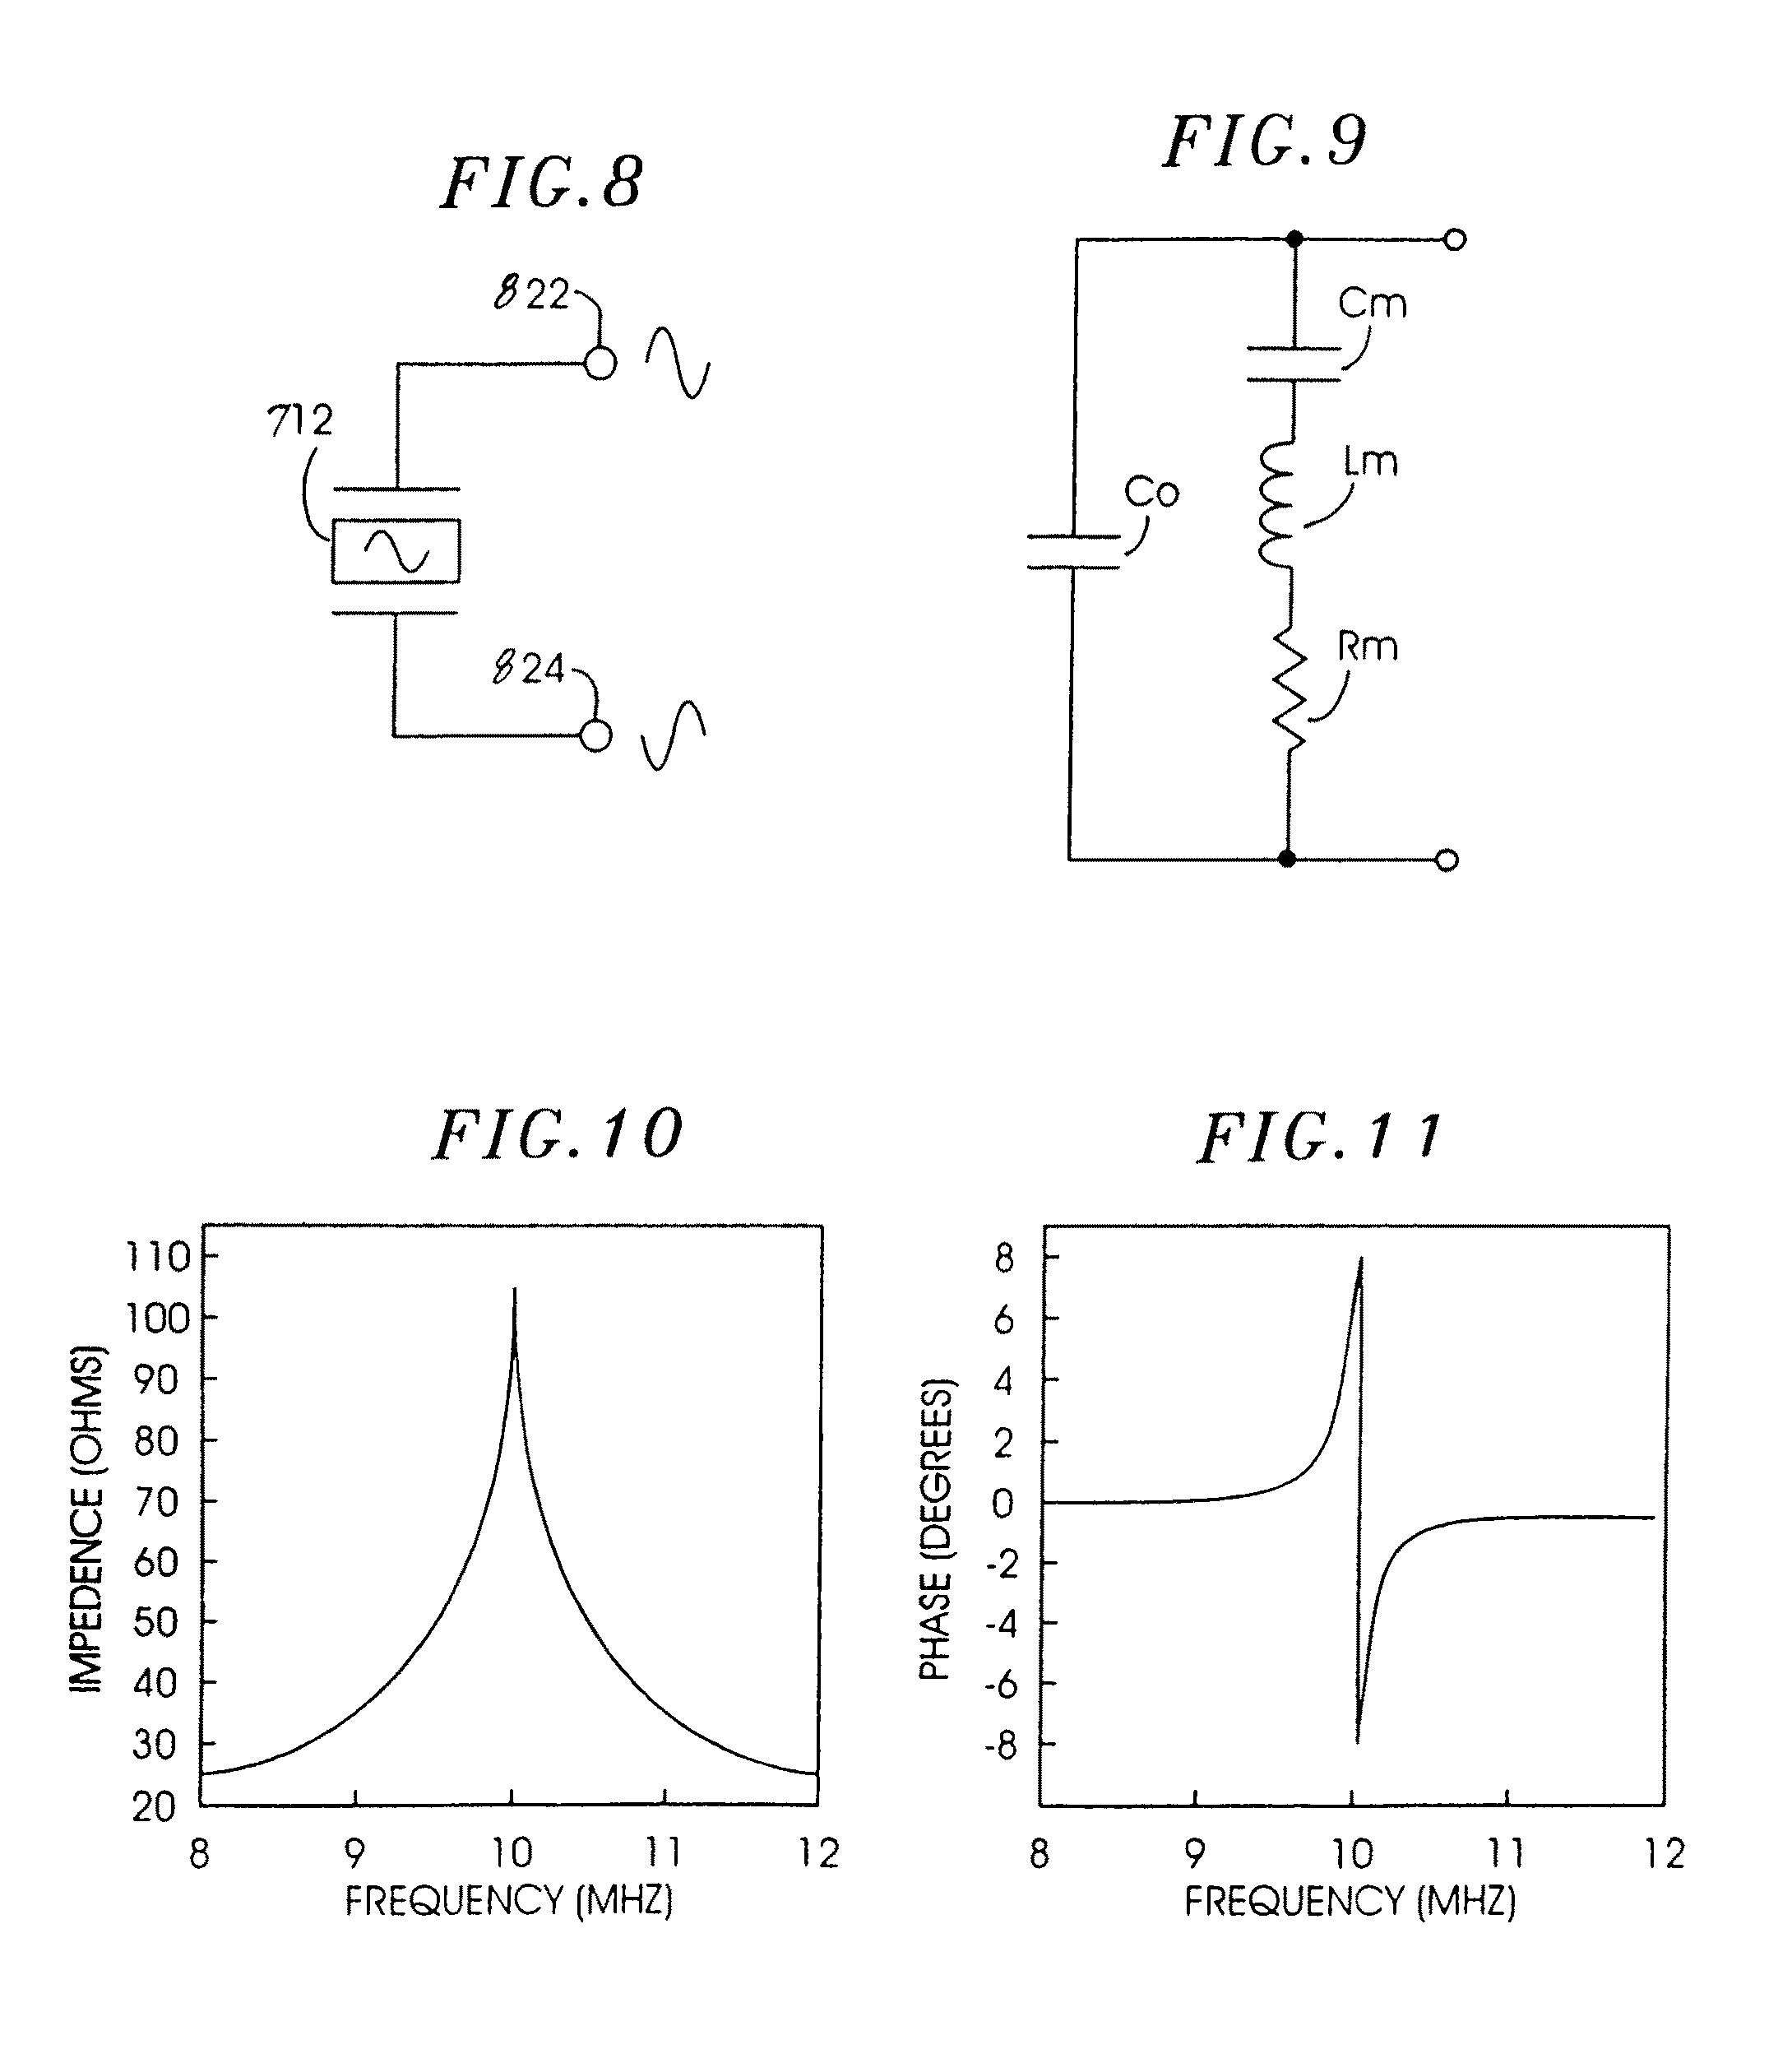 patent argument essay